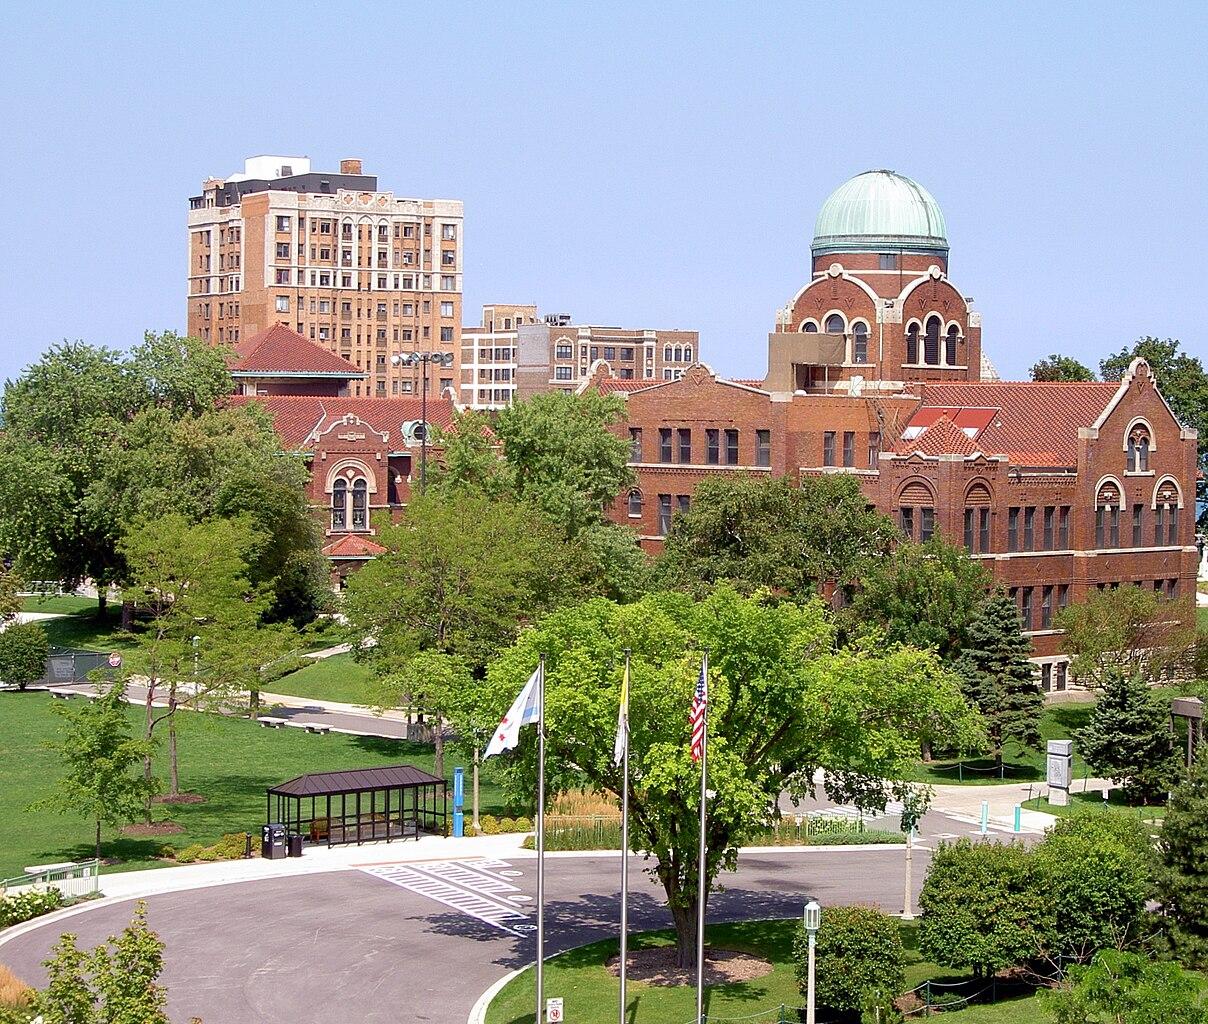 Fichier:Dumbach, Cudahy Hall, Loyola University Chicago ... Пенсильванский Университет